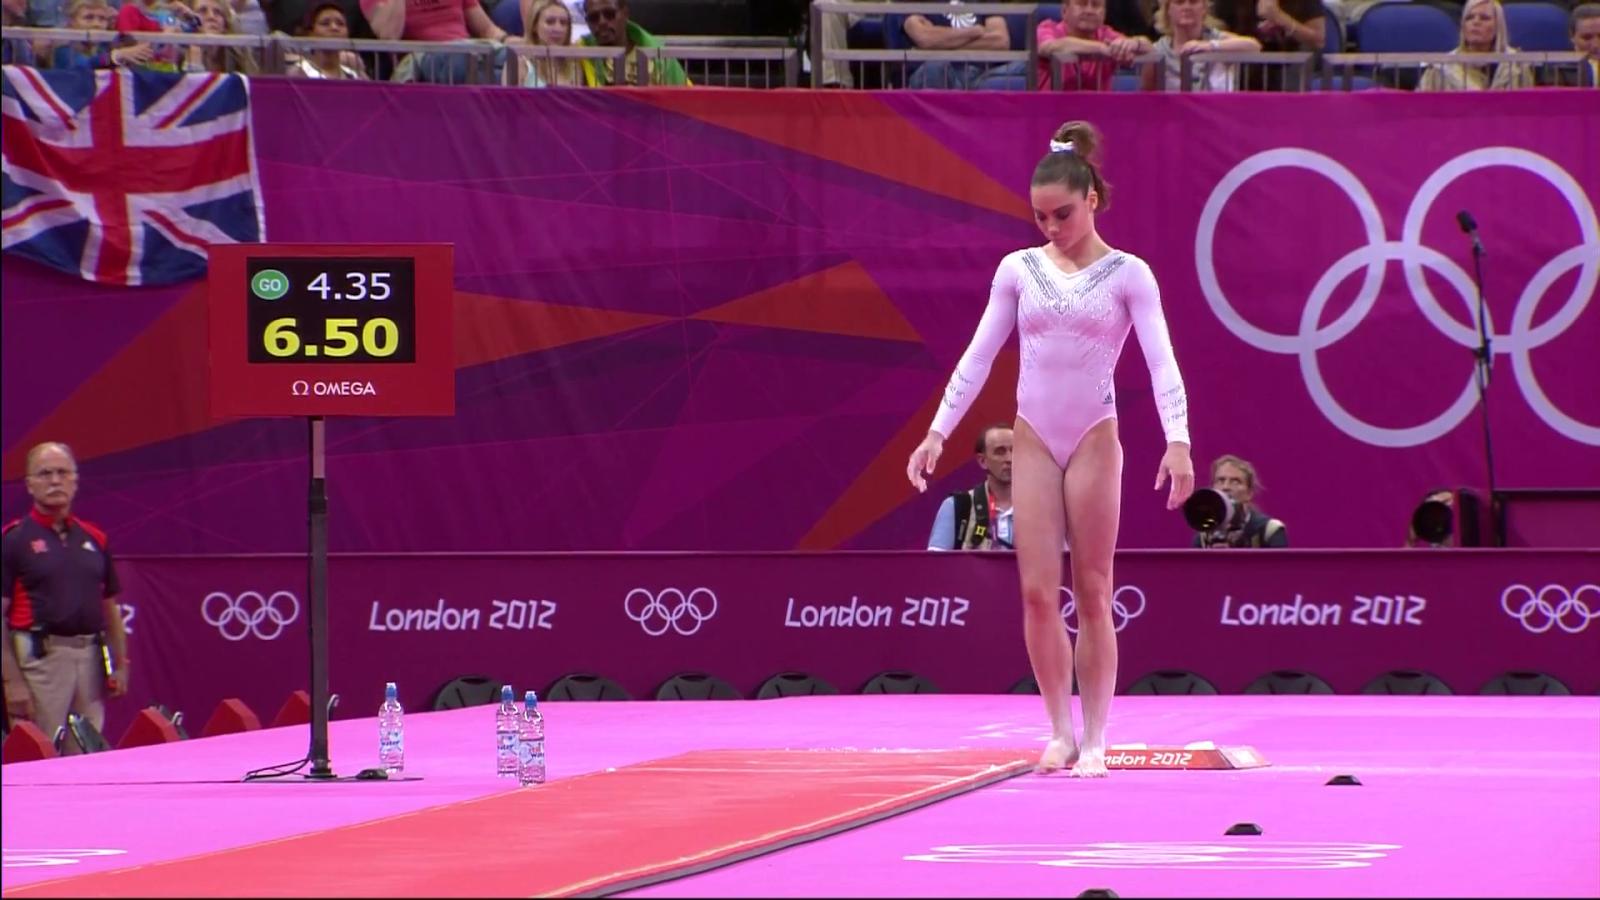 vault gymnastics gif. McKayla Maroney - Gymnastics Artistic Womens Vault Final London 2012 Olympic Games Gif And Pics